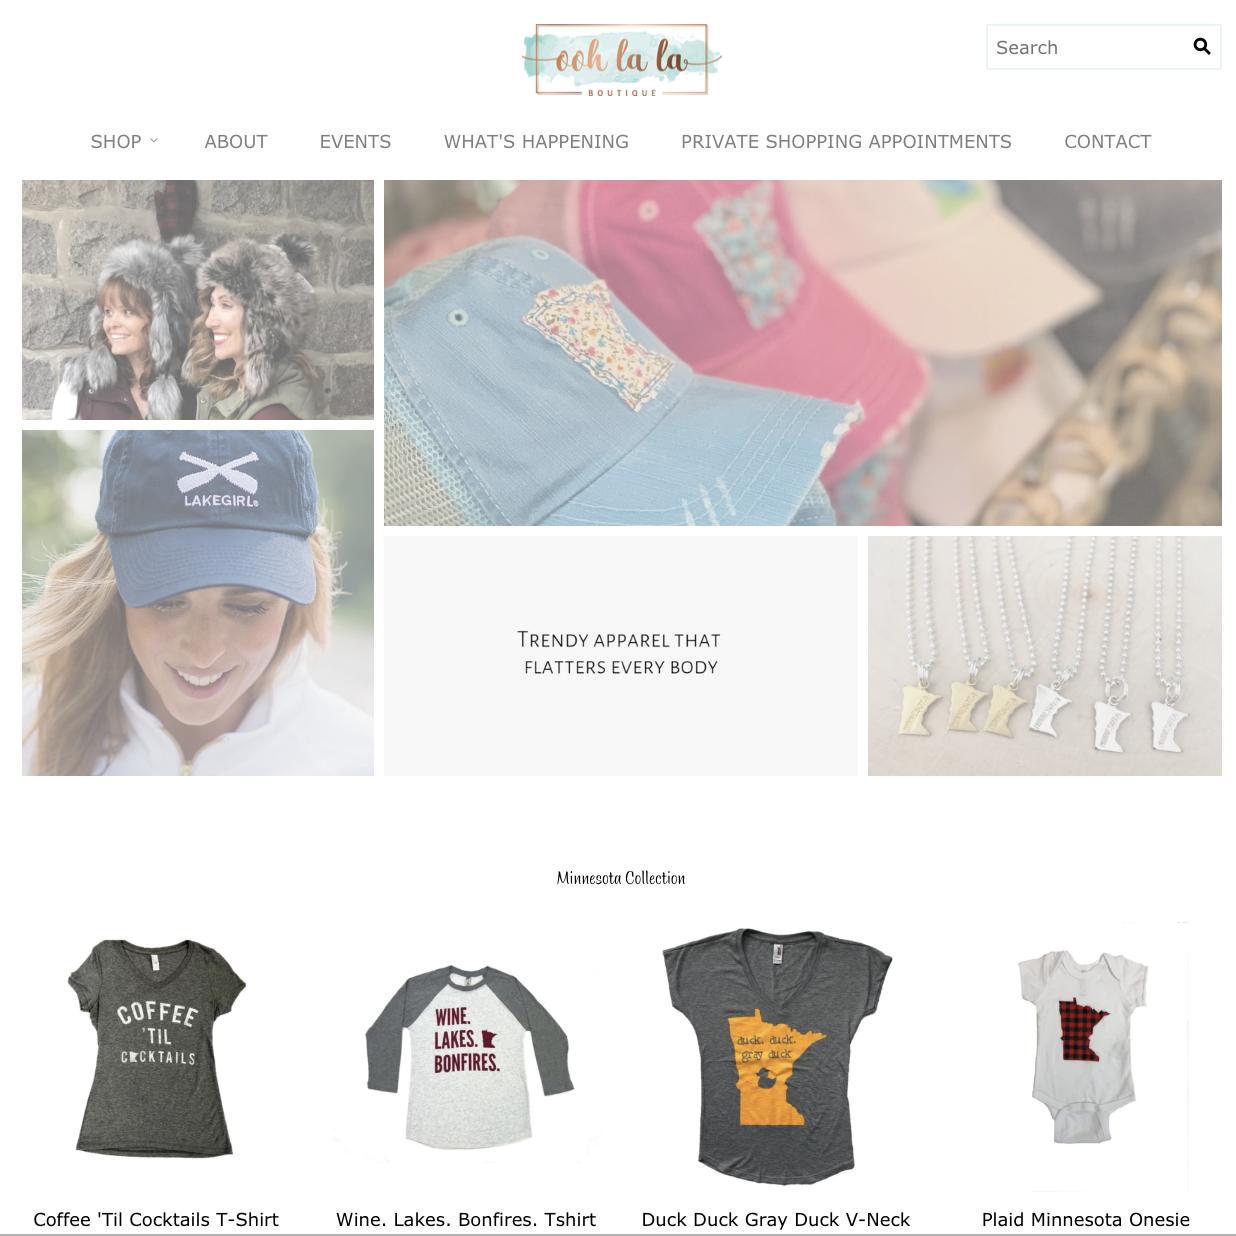 Ooh La La Boutique Website